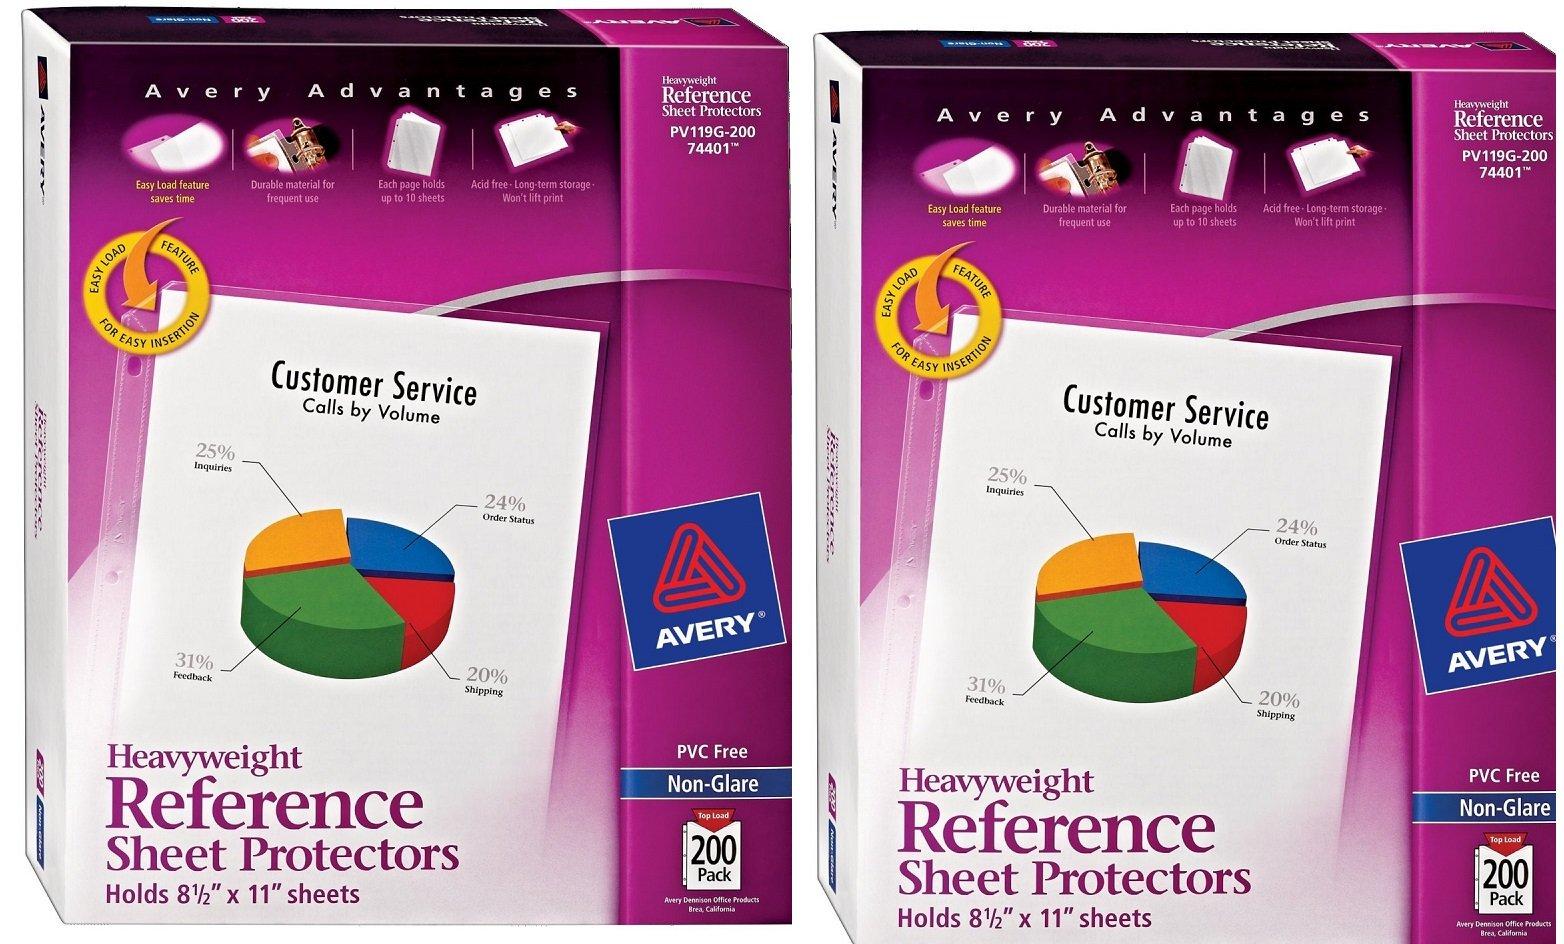 Avery Non-Glare Heavyweight Sheet Protectors DAscme,Top Loading, 400 Sheets (74401)